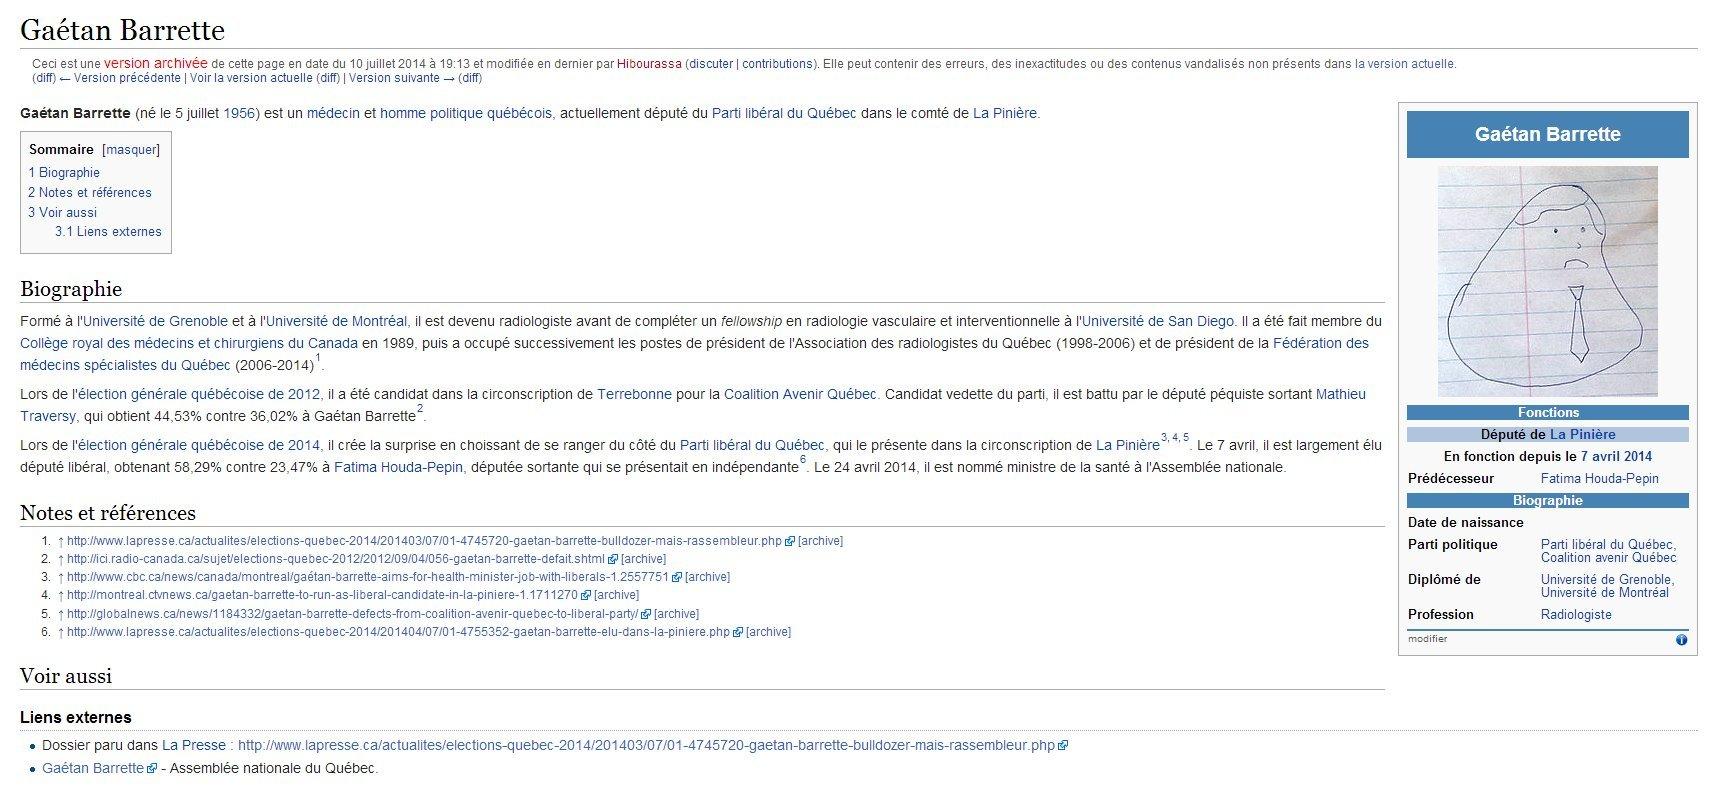 huffpost wikipedia huffpost wikipedia le nouveau portrait